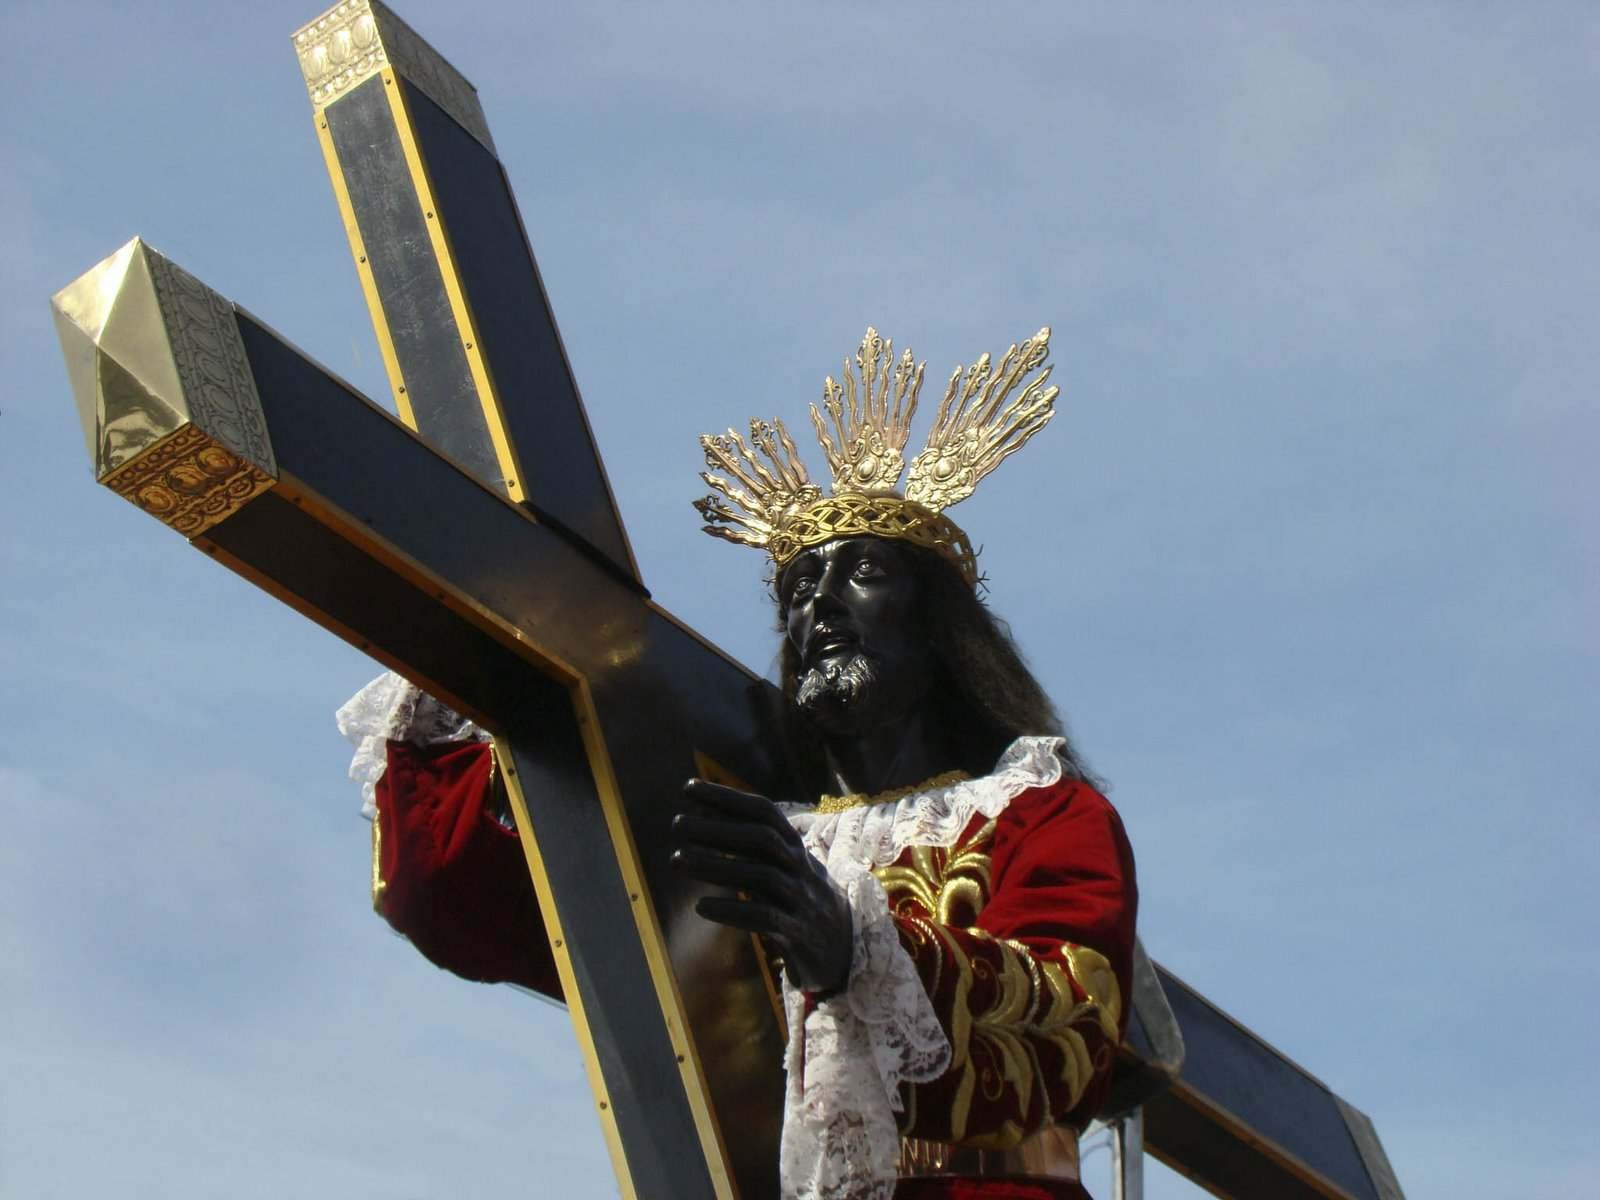 Feast of the Black Nazarene – Philippines